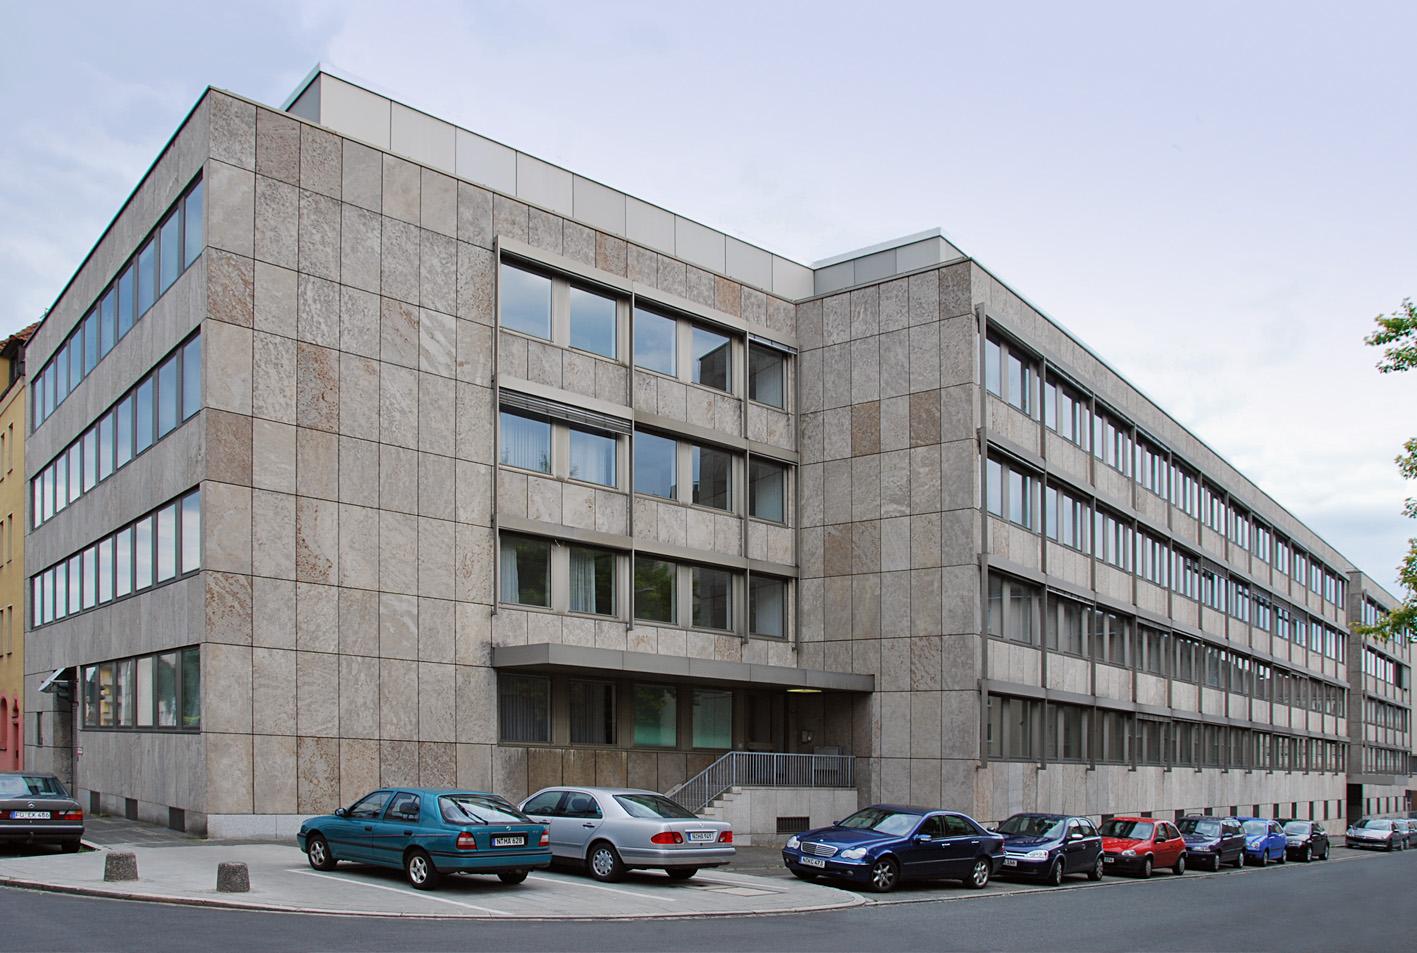 Projektentwickklung-KLAPPAN-Bürohaus-Nürnberg-Rudolphstraße